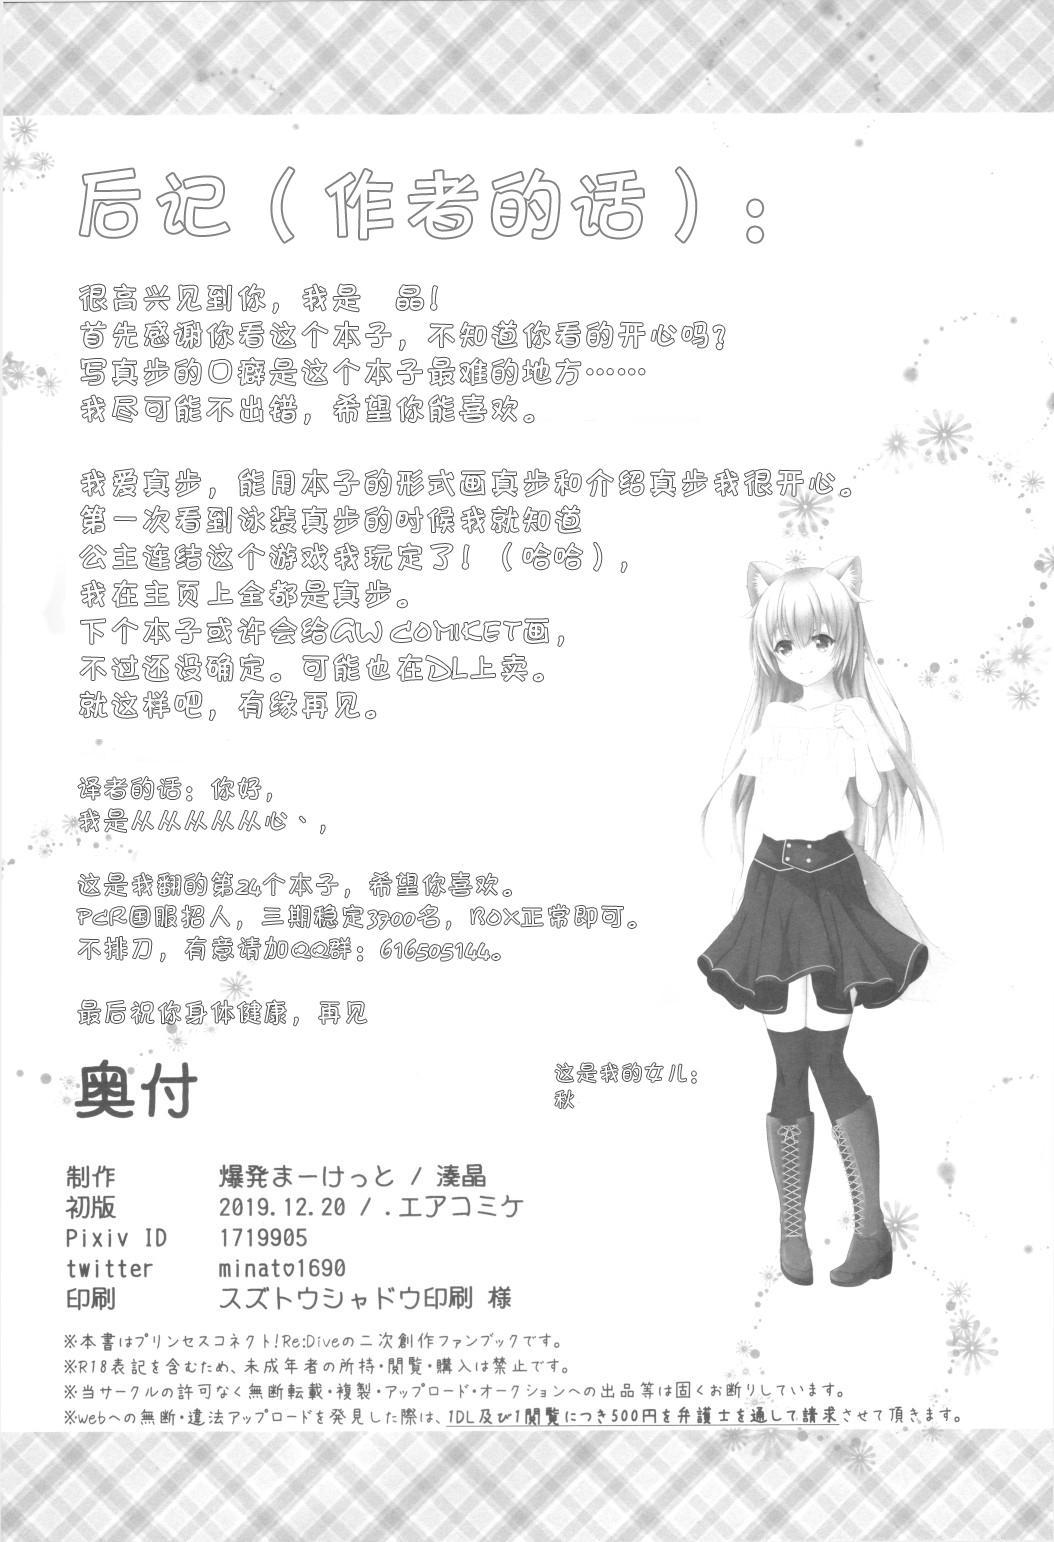 (AC2) [Bakuhatsu Market (Minato Akira)] Maho Hime Connect! (Princess Connect! Re:Dive)[Chinese]【不可视汉化】 21